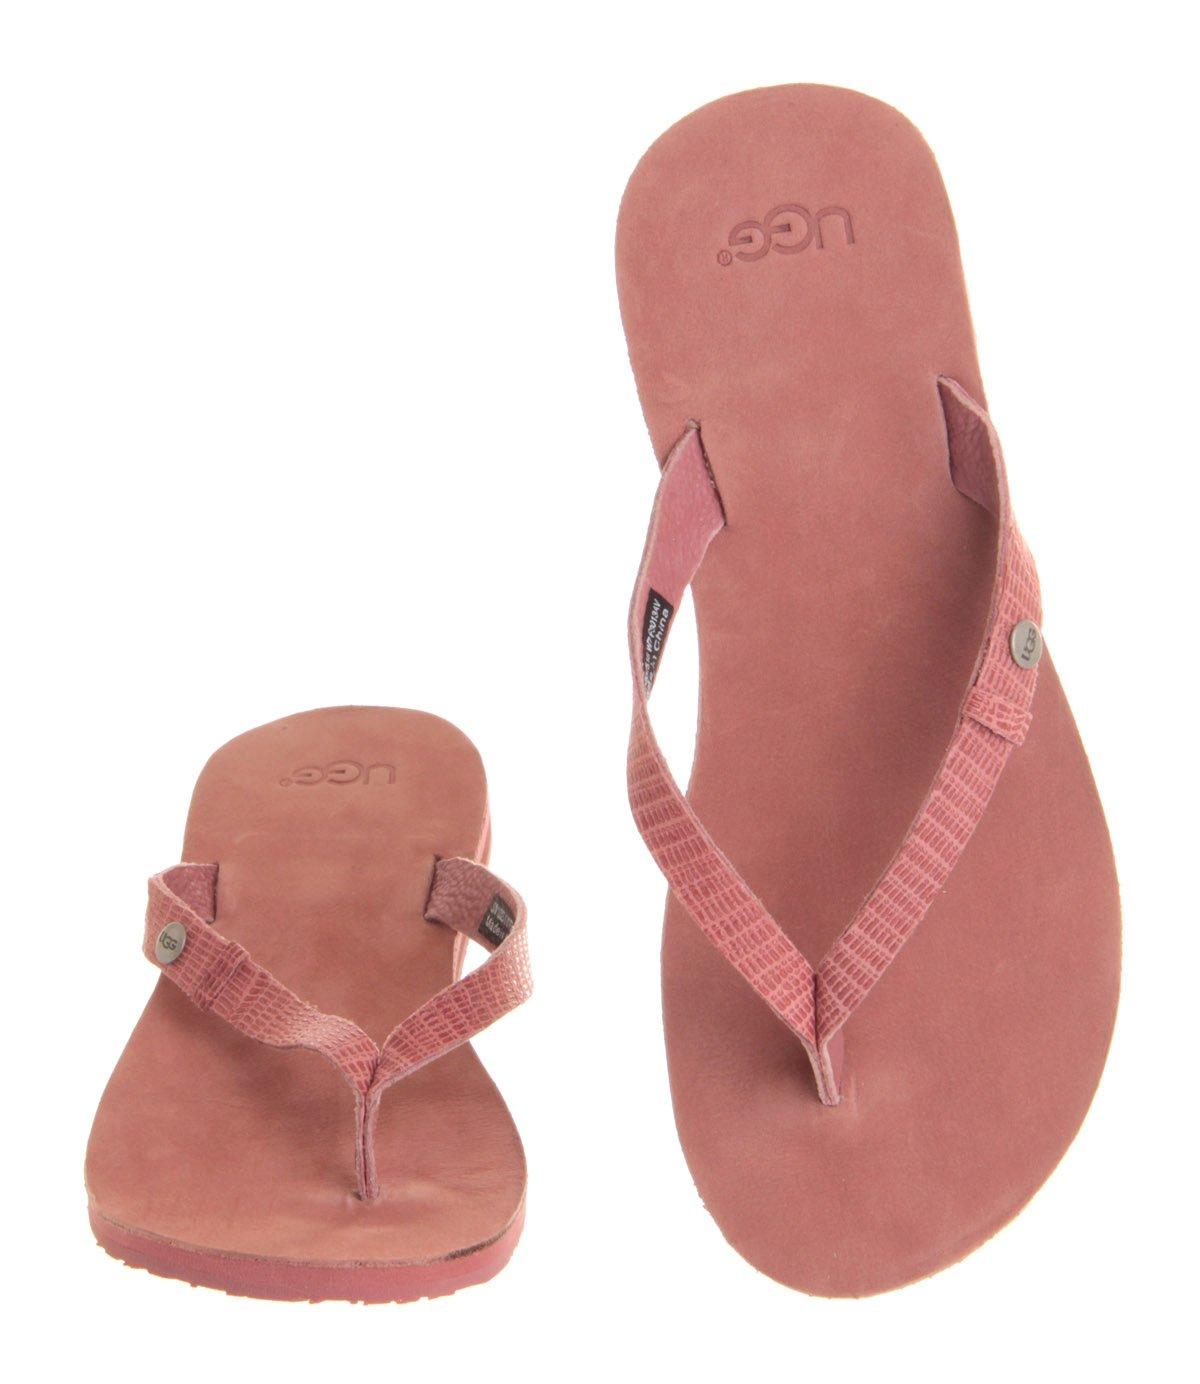 8a40f59f4175 Lyst - UGG Ally Flip Flop in Pink